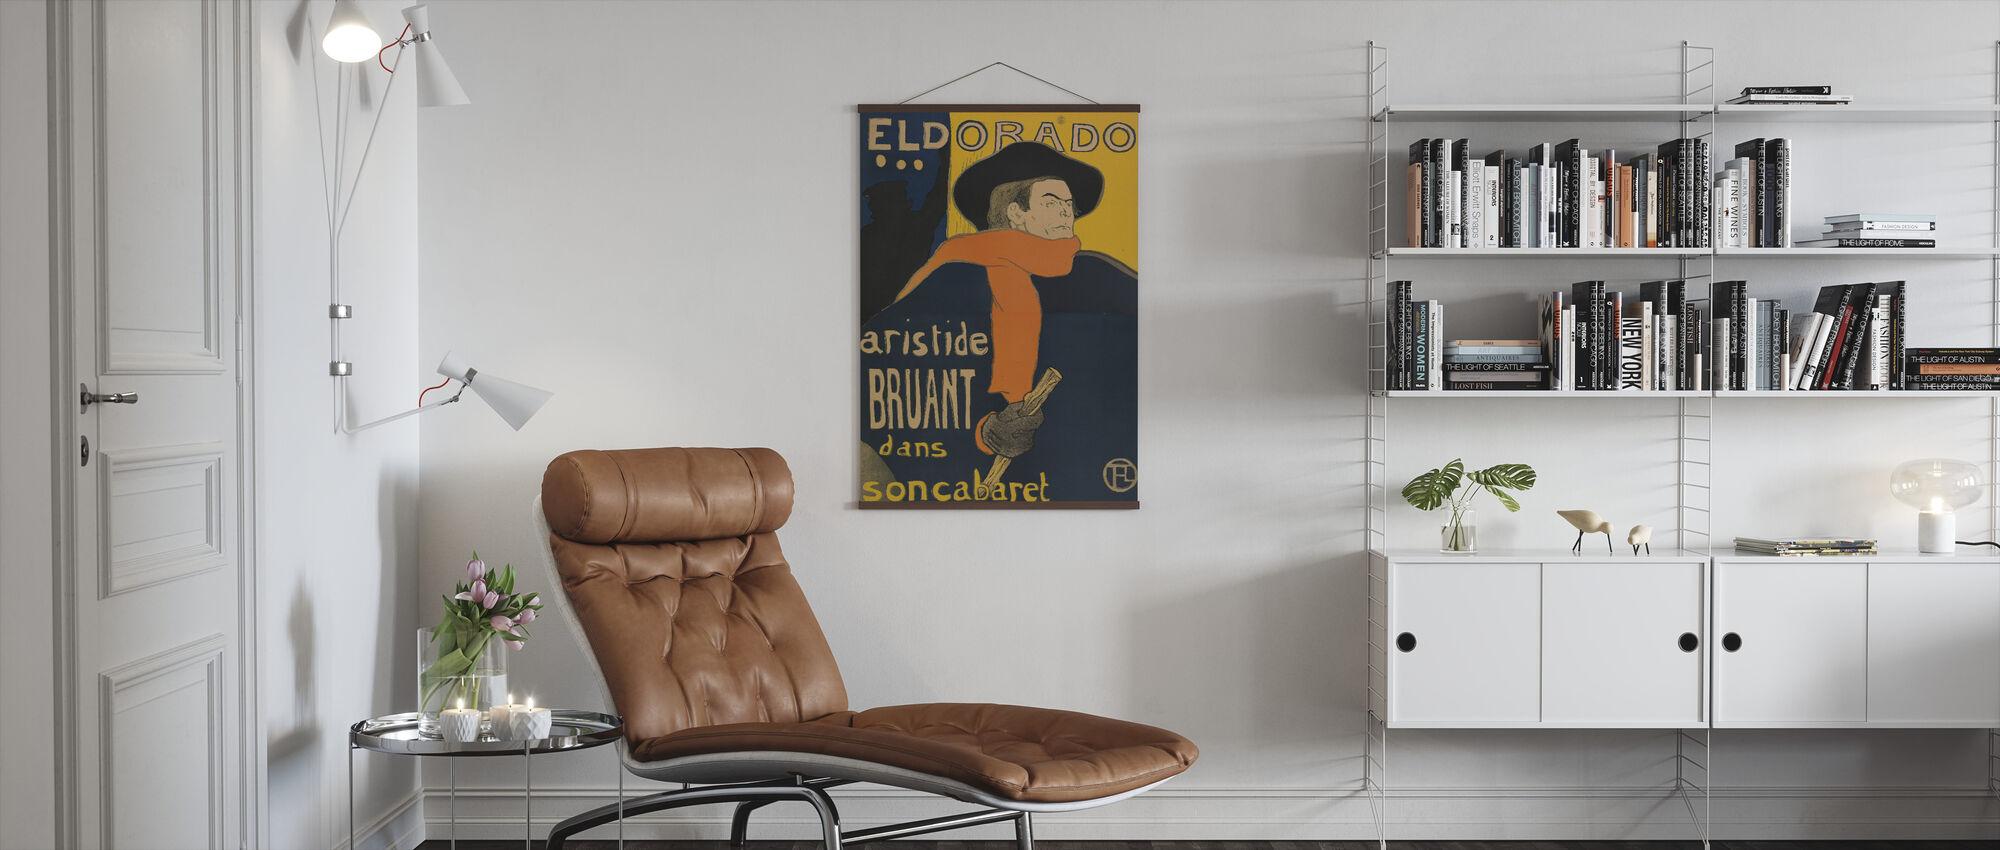 Café konsert Eldorado - Aristide Bruant - Plakat - Stue